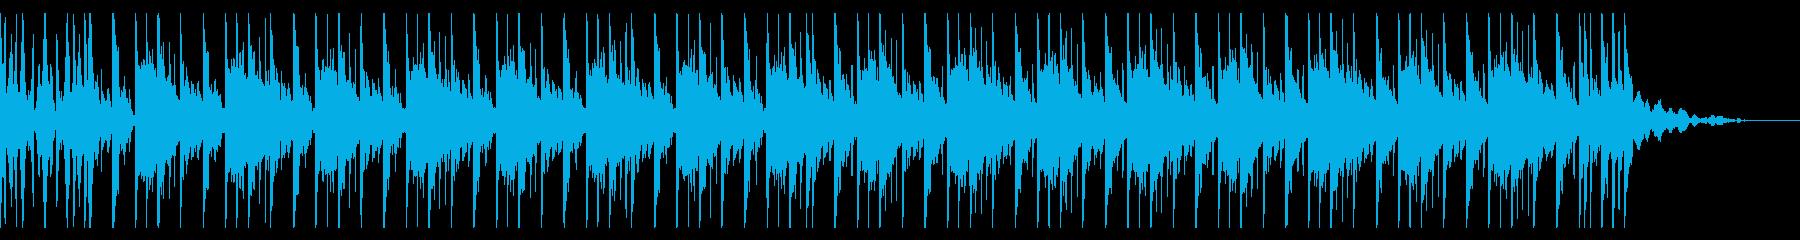 150 BPMの再生済みの波形